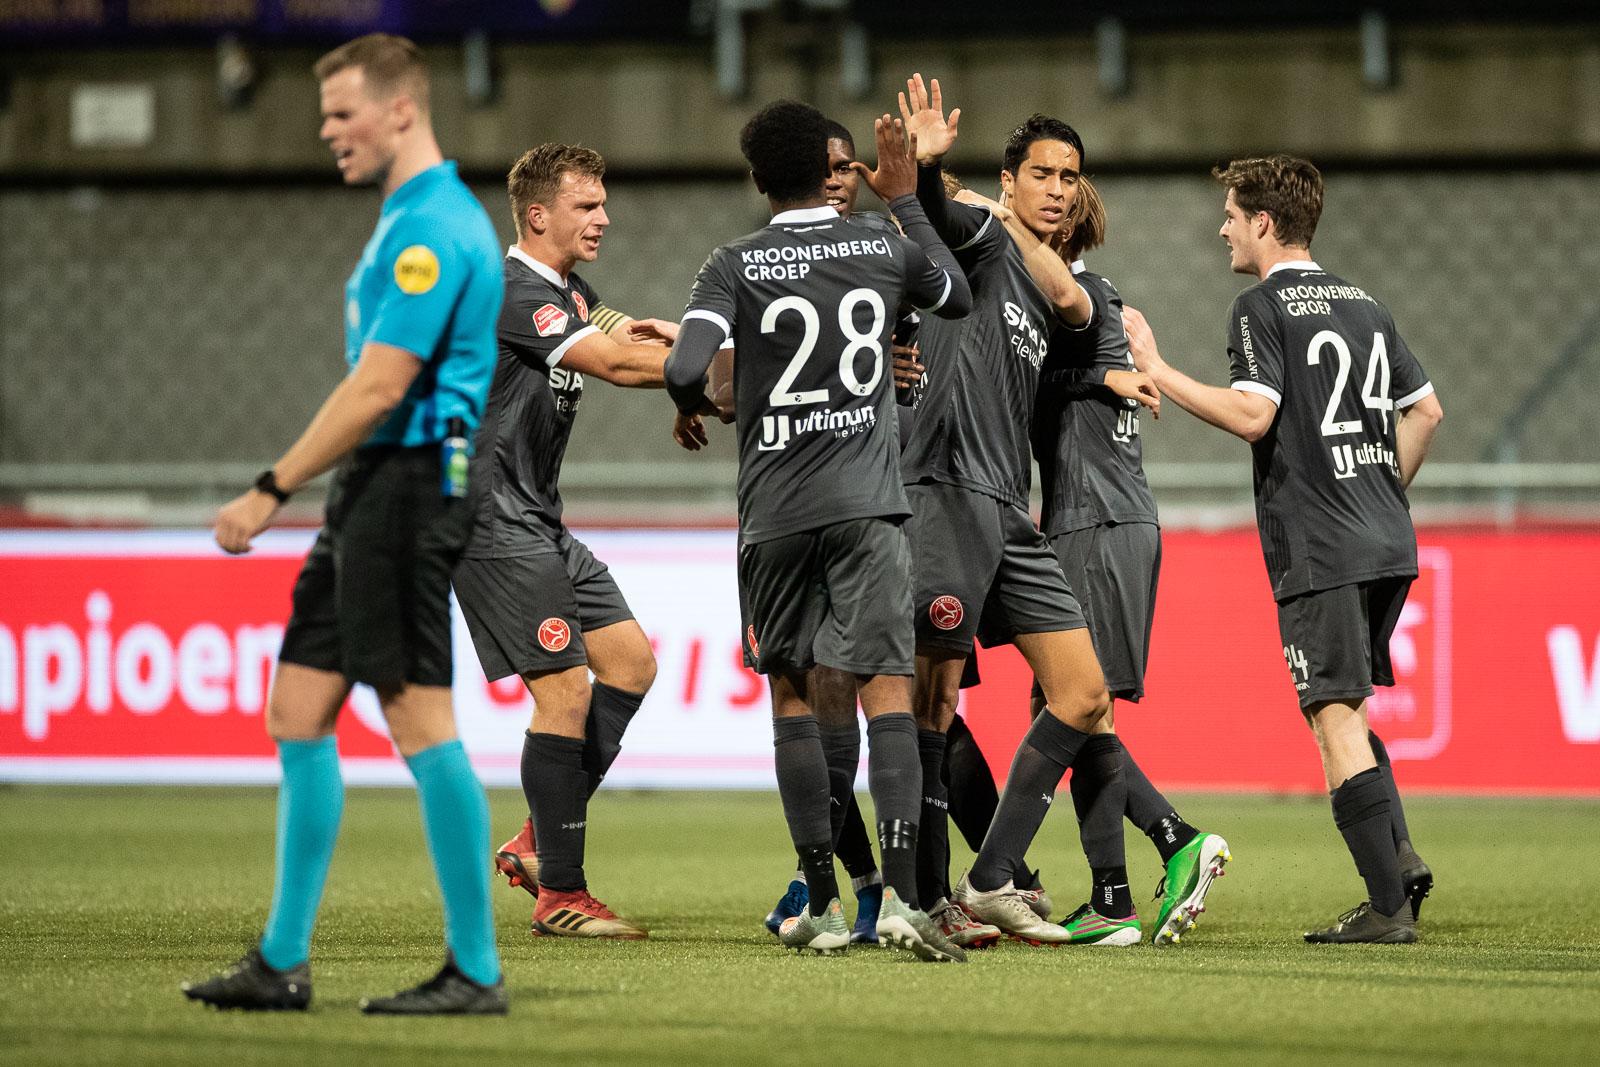 Almere City FC start thuis tegen MVV op zondag 30 augustus